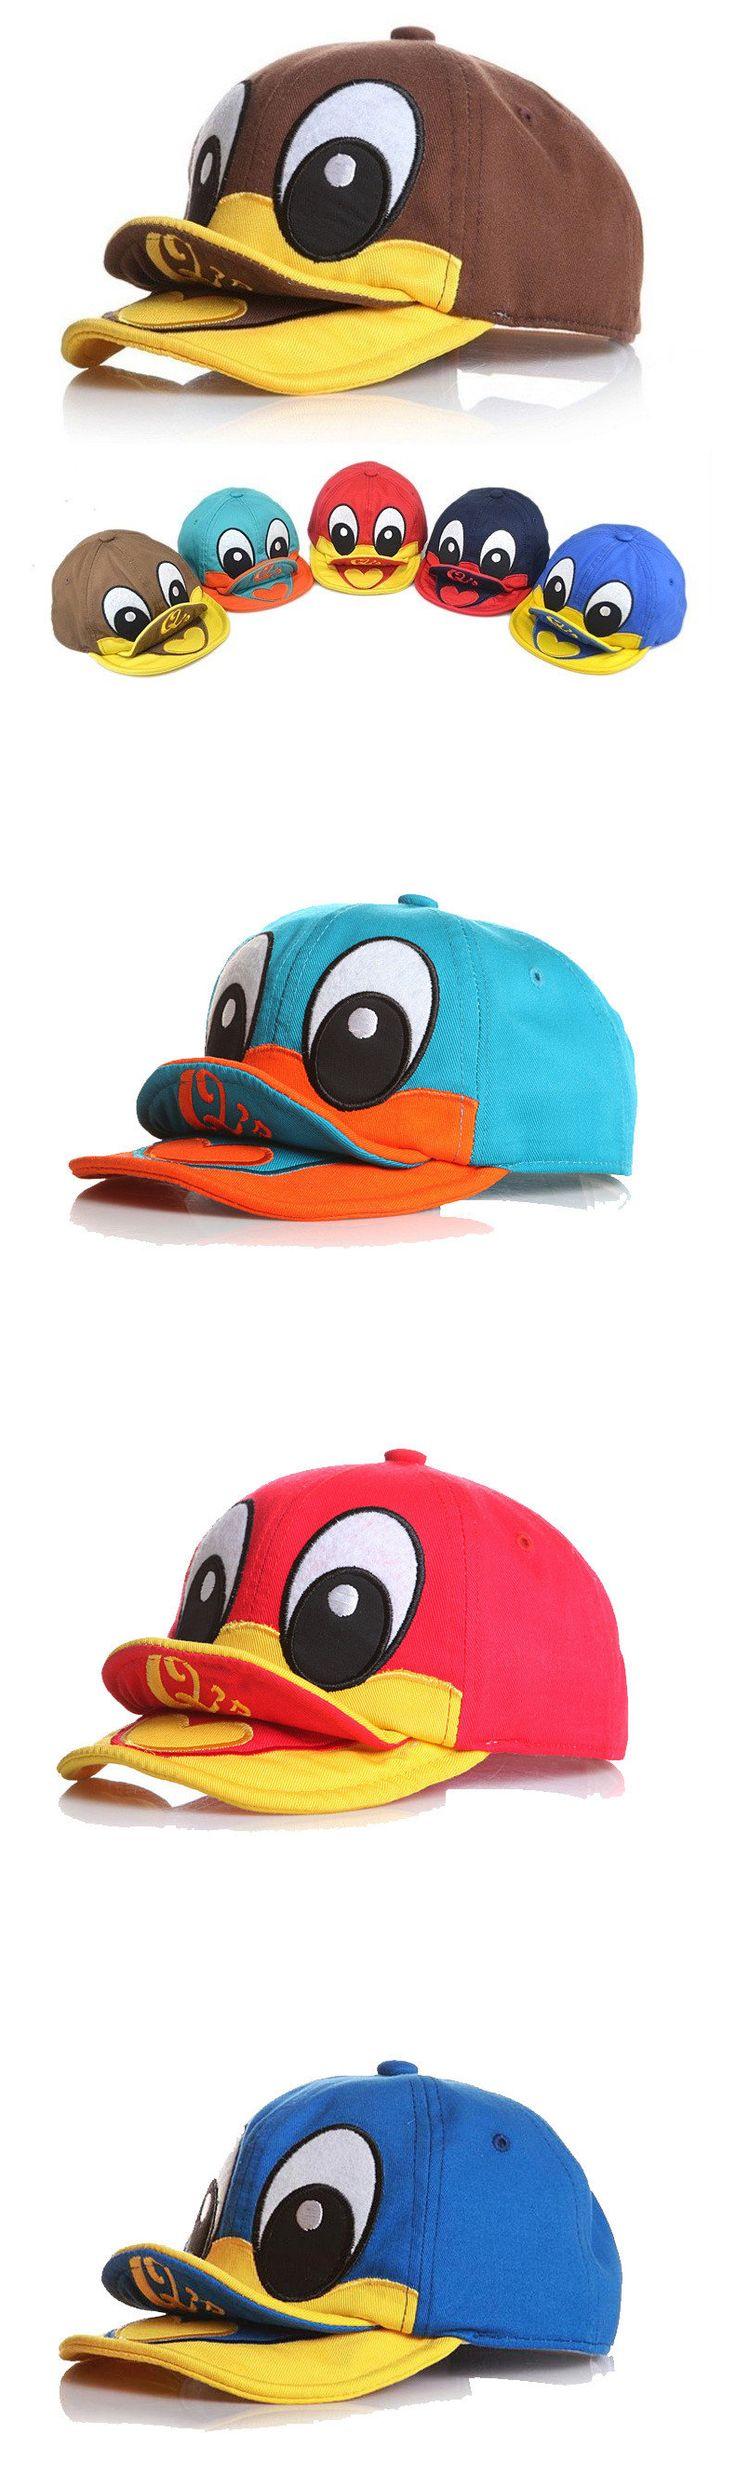 White baseball caps for crafts - White Baseball Caps For Crafts Baby Kids Cute Duck Design Baseball Caps Toddler Peaked Beret